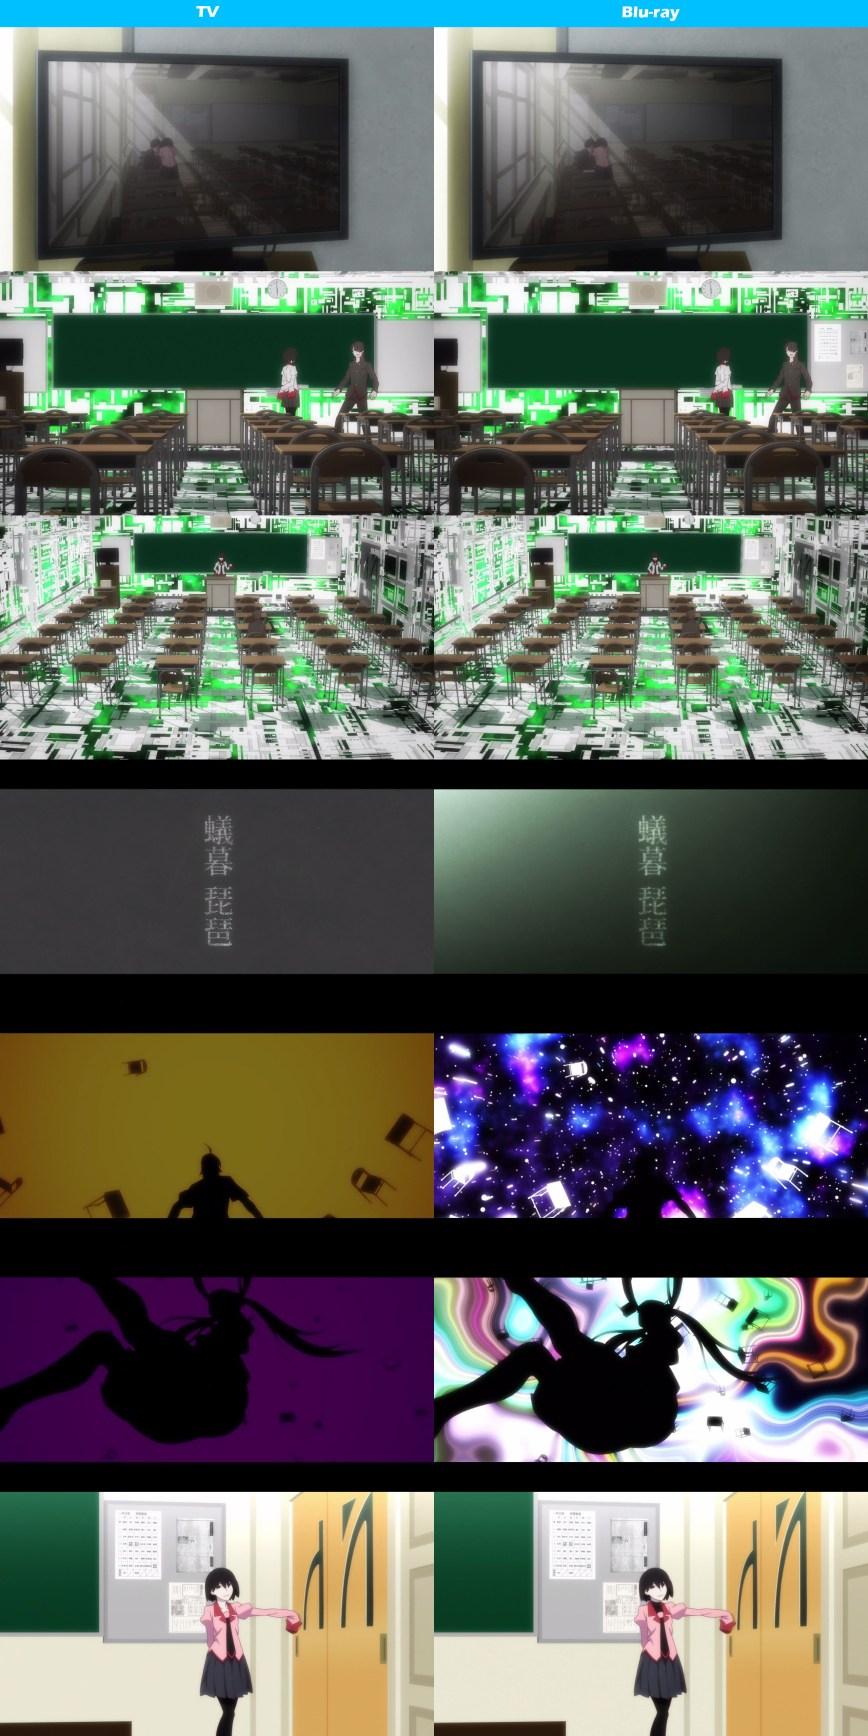 Owarimonogatari-TV-and-Blu-Ray-Comparison-Image